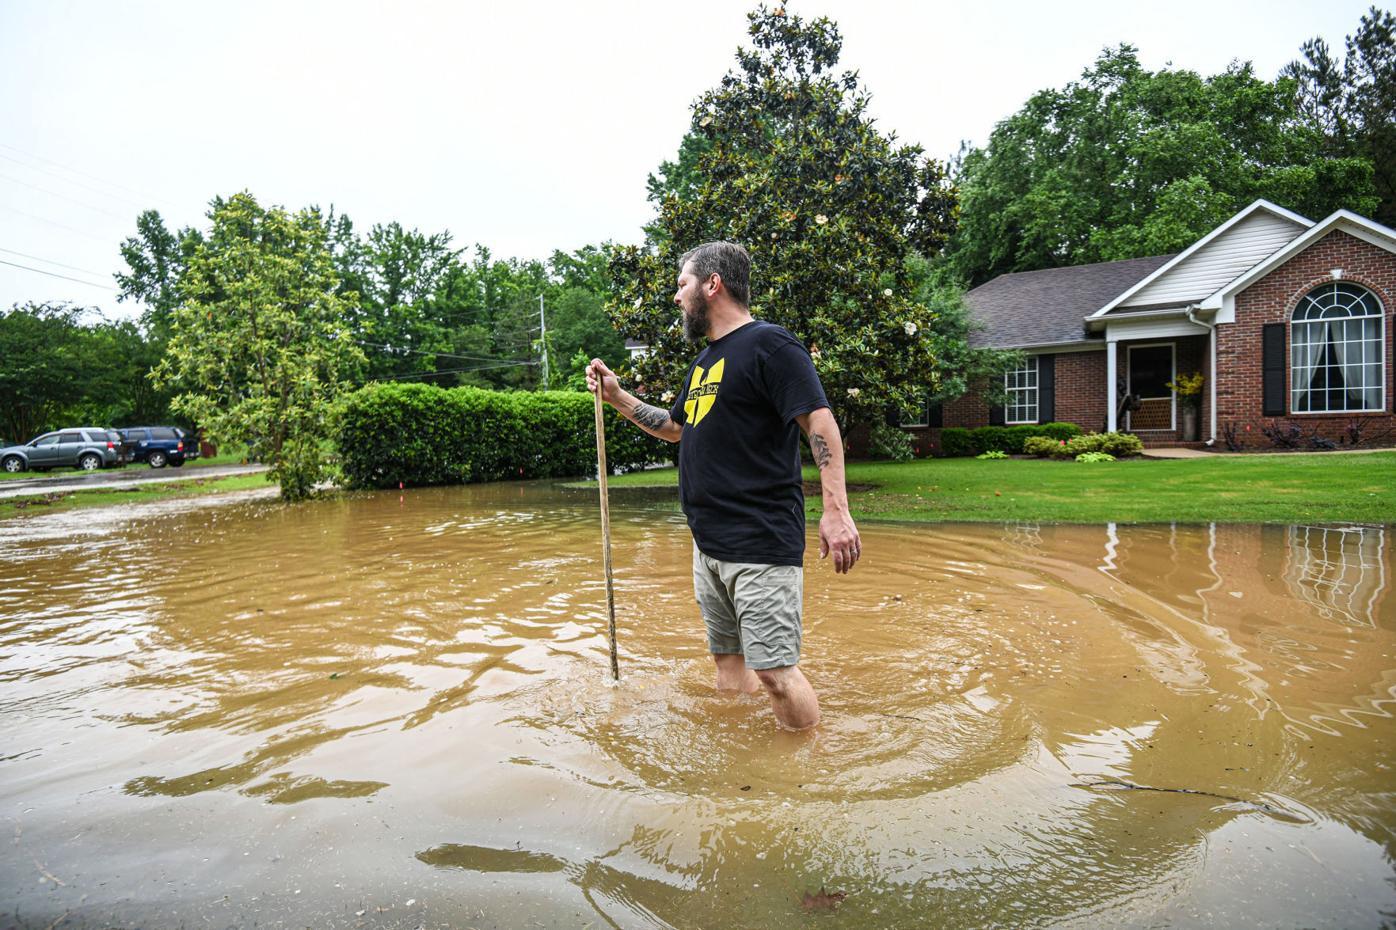 djr-2021-06-10-news-oxford-flooding-bnp3